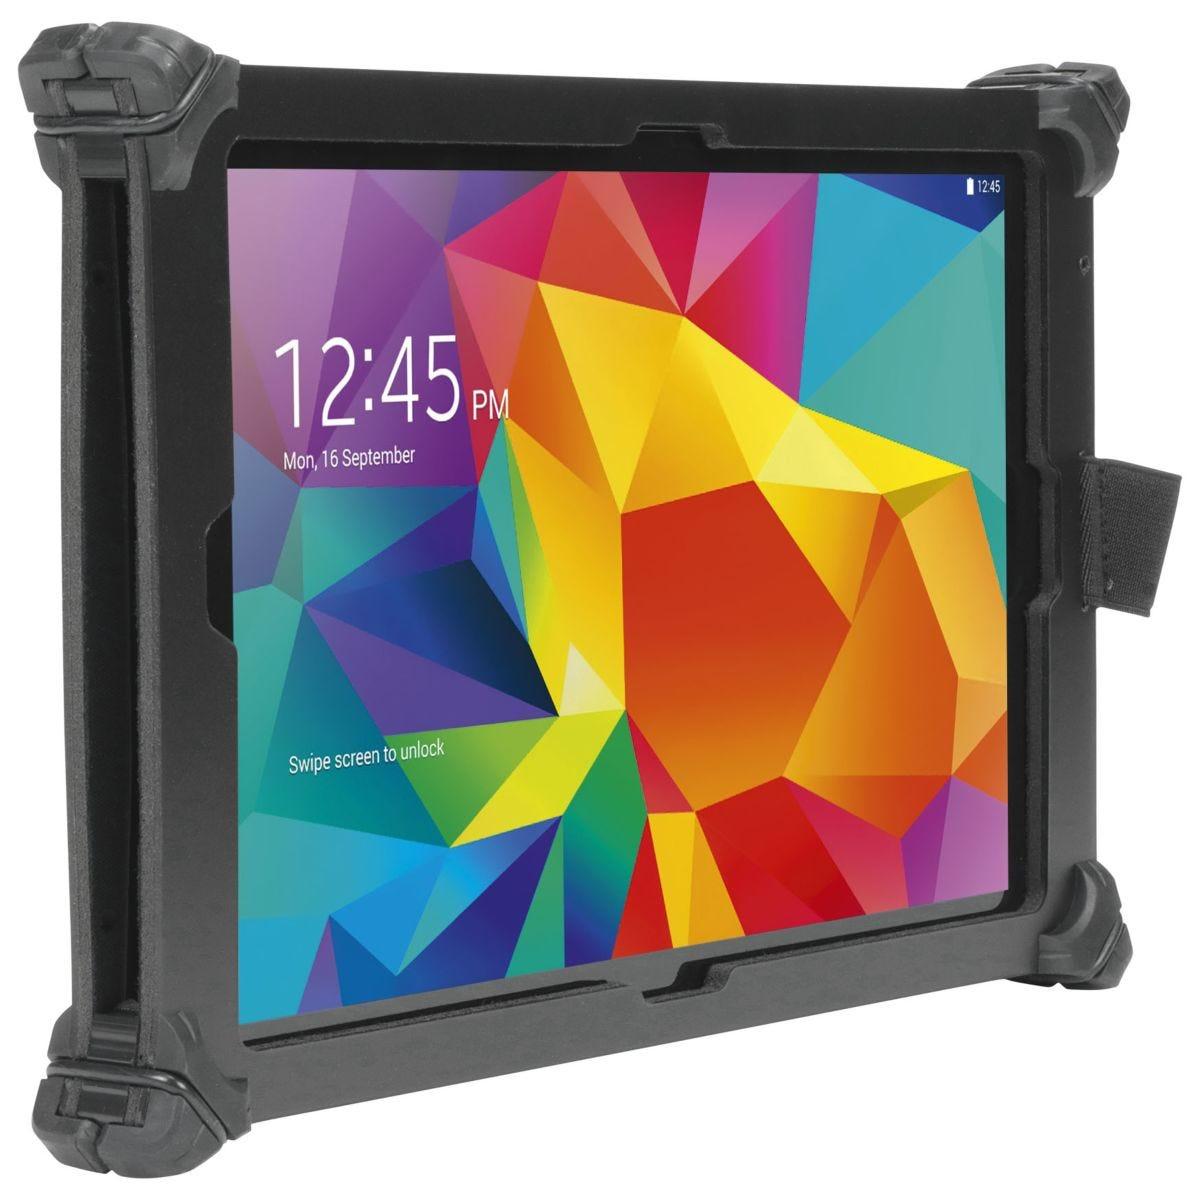 Mobilis RESIST Case for Galaxy Tab A 2018 10.5 - Black